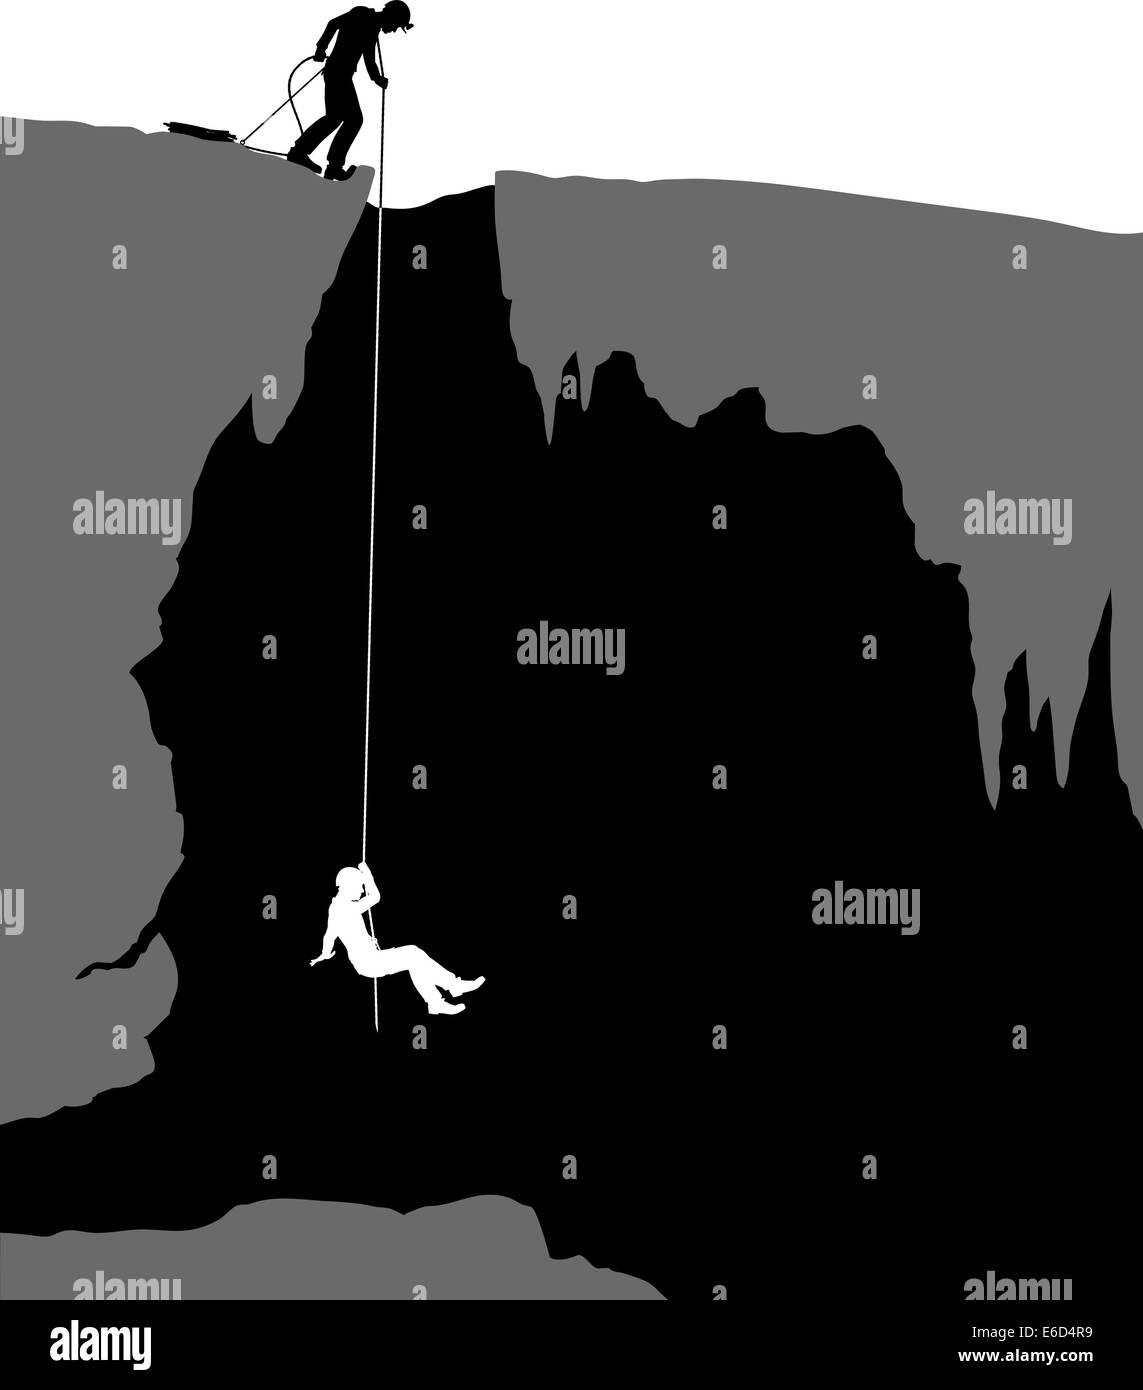 Editable vector illustration of cavers exploring a cave - Stock Vector